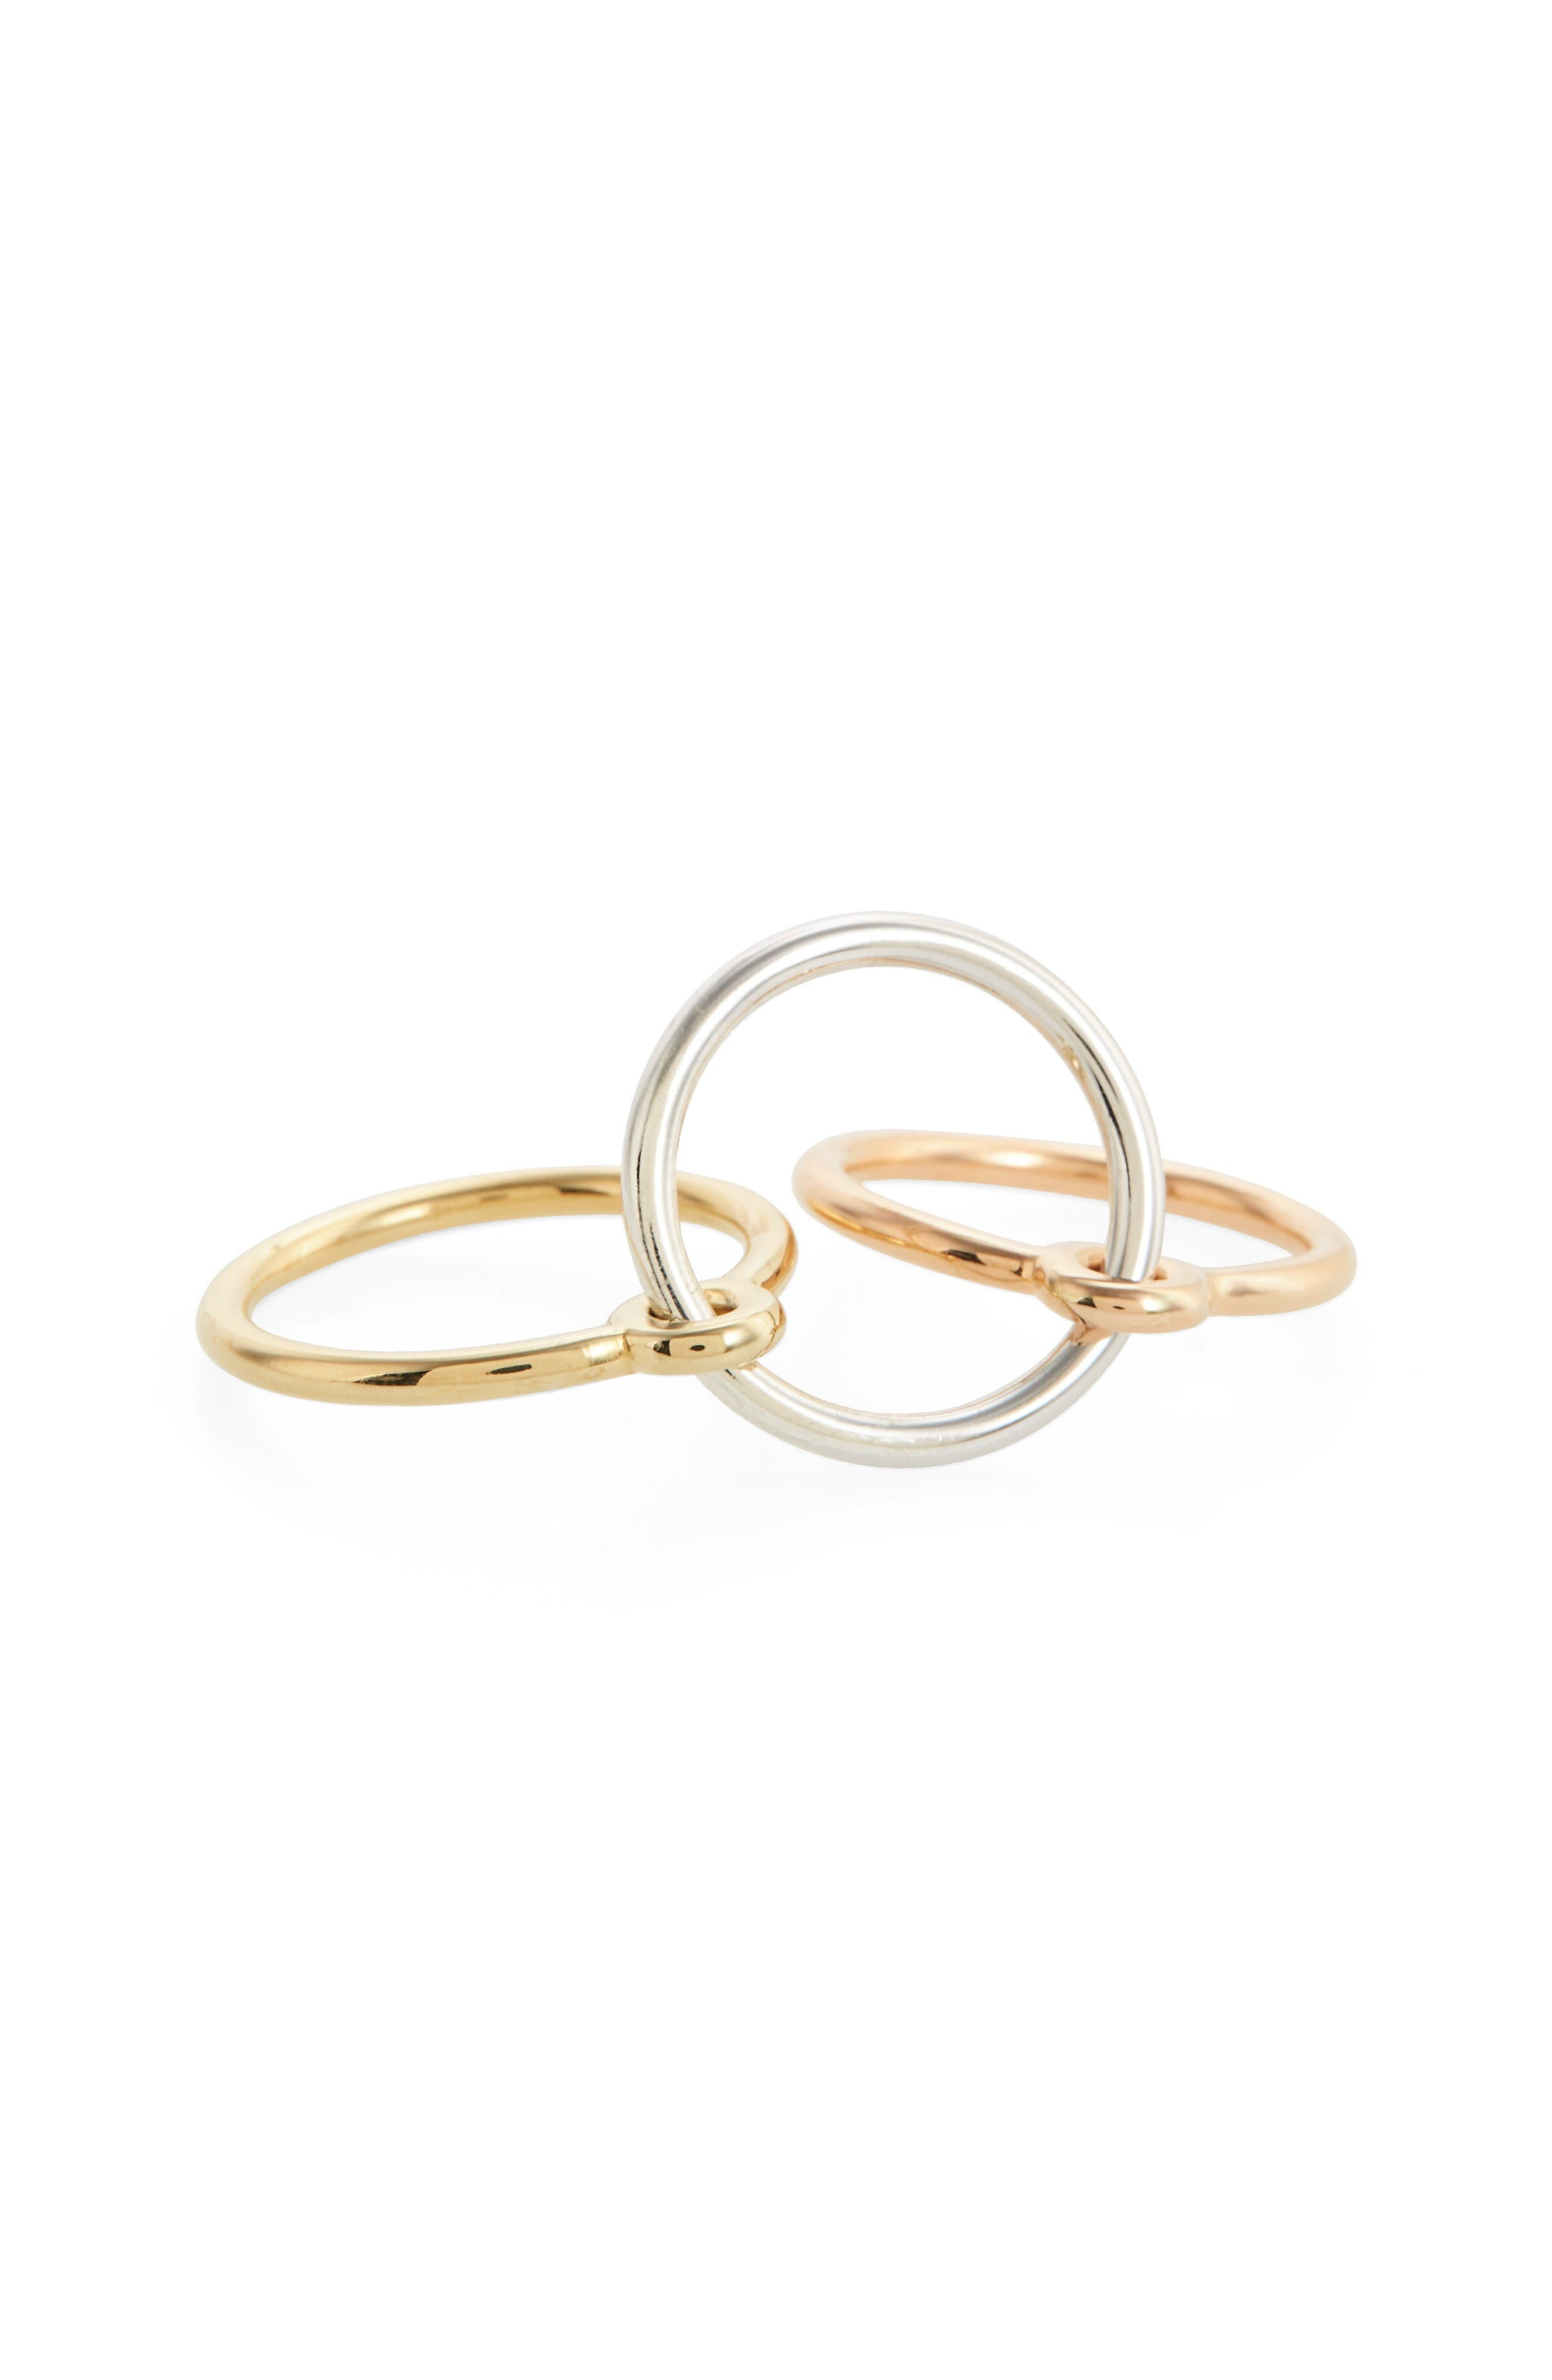 Charlotte Chesnais Three Lovers Linked Rings